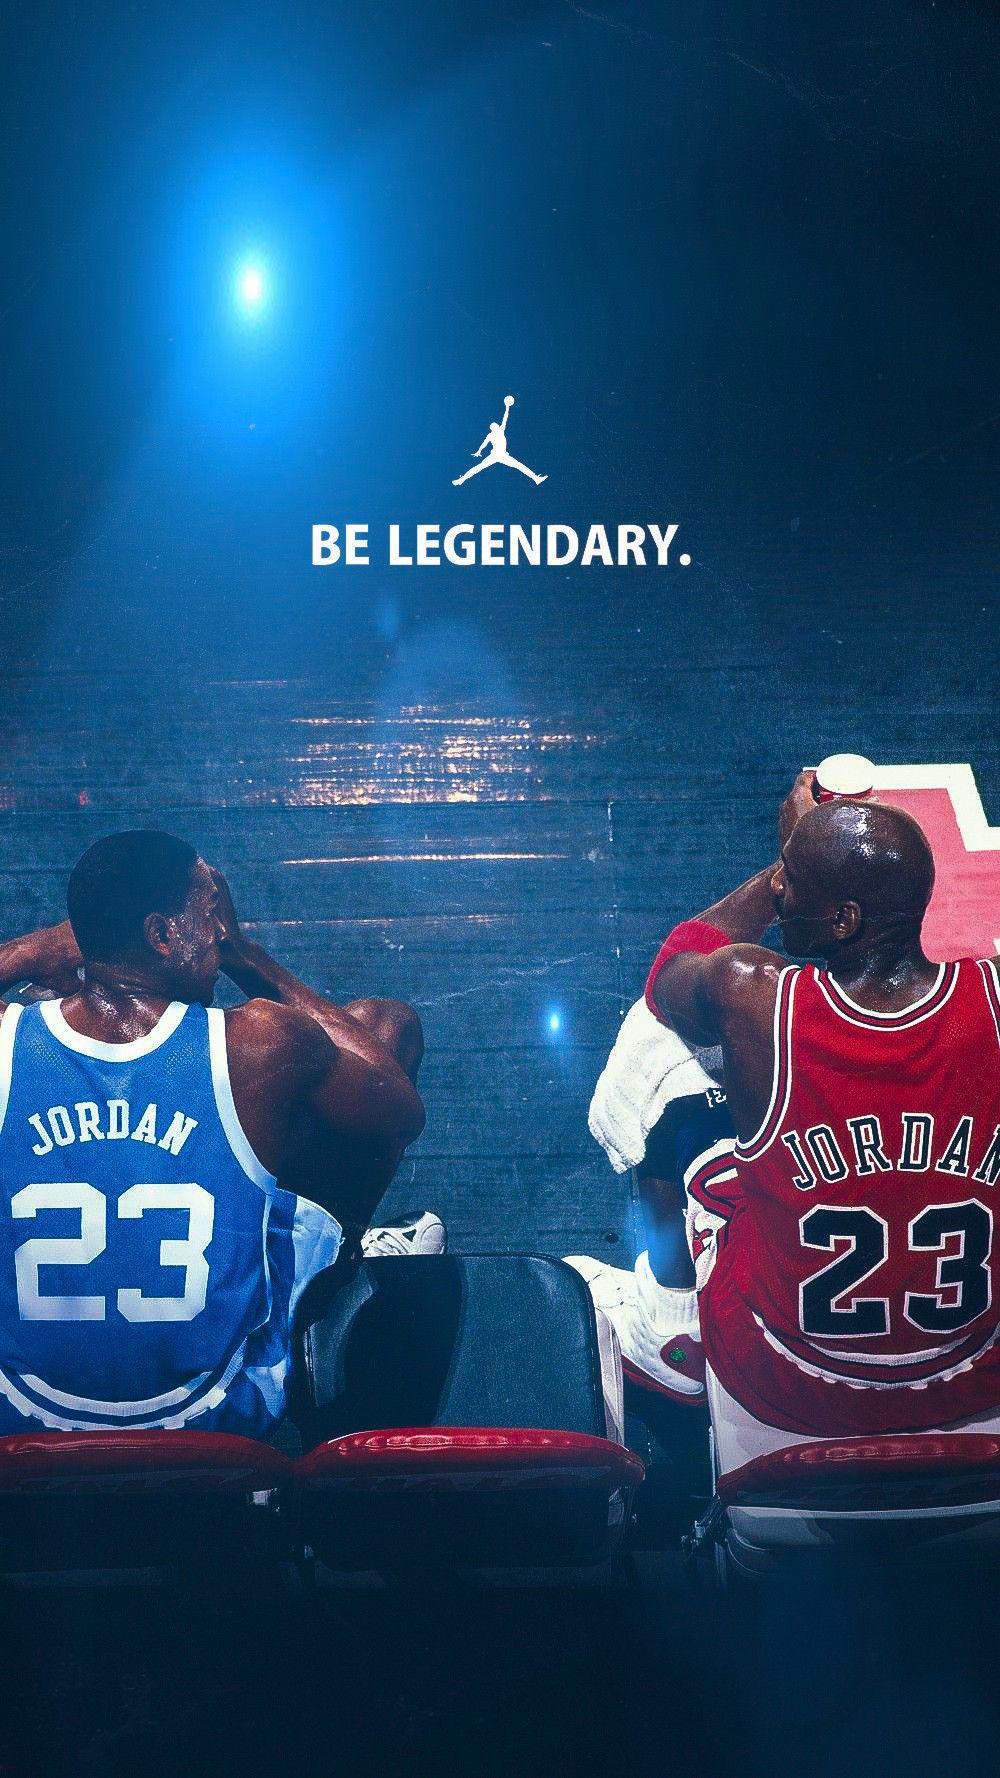 Pin By Jeff Noble On Nba Wallpapers Basketball Wallpaper Basketball Photography Michael Jordan Basketball